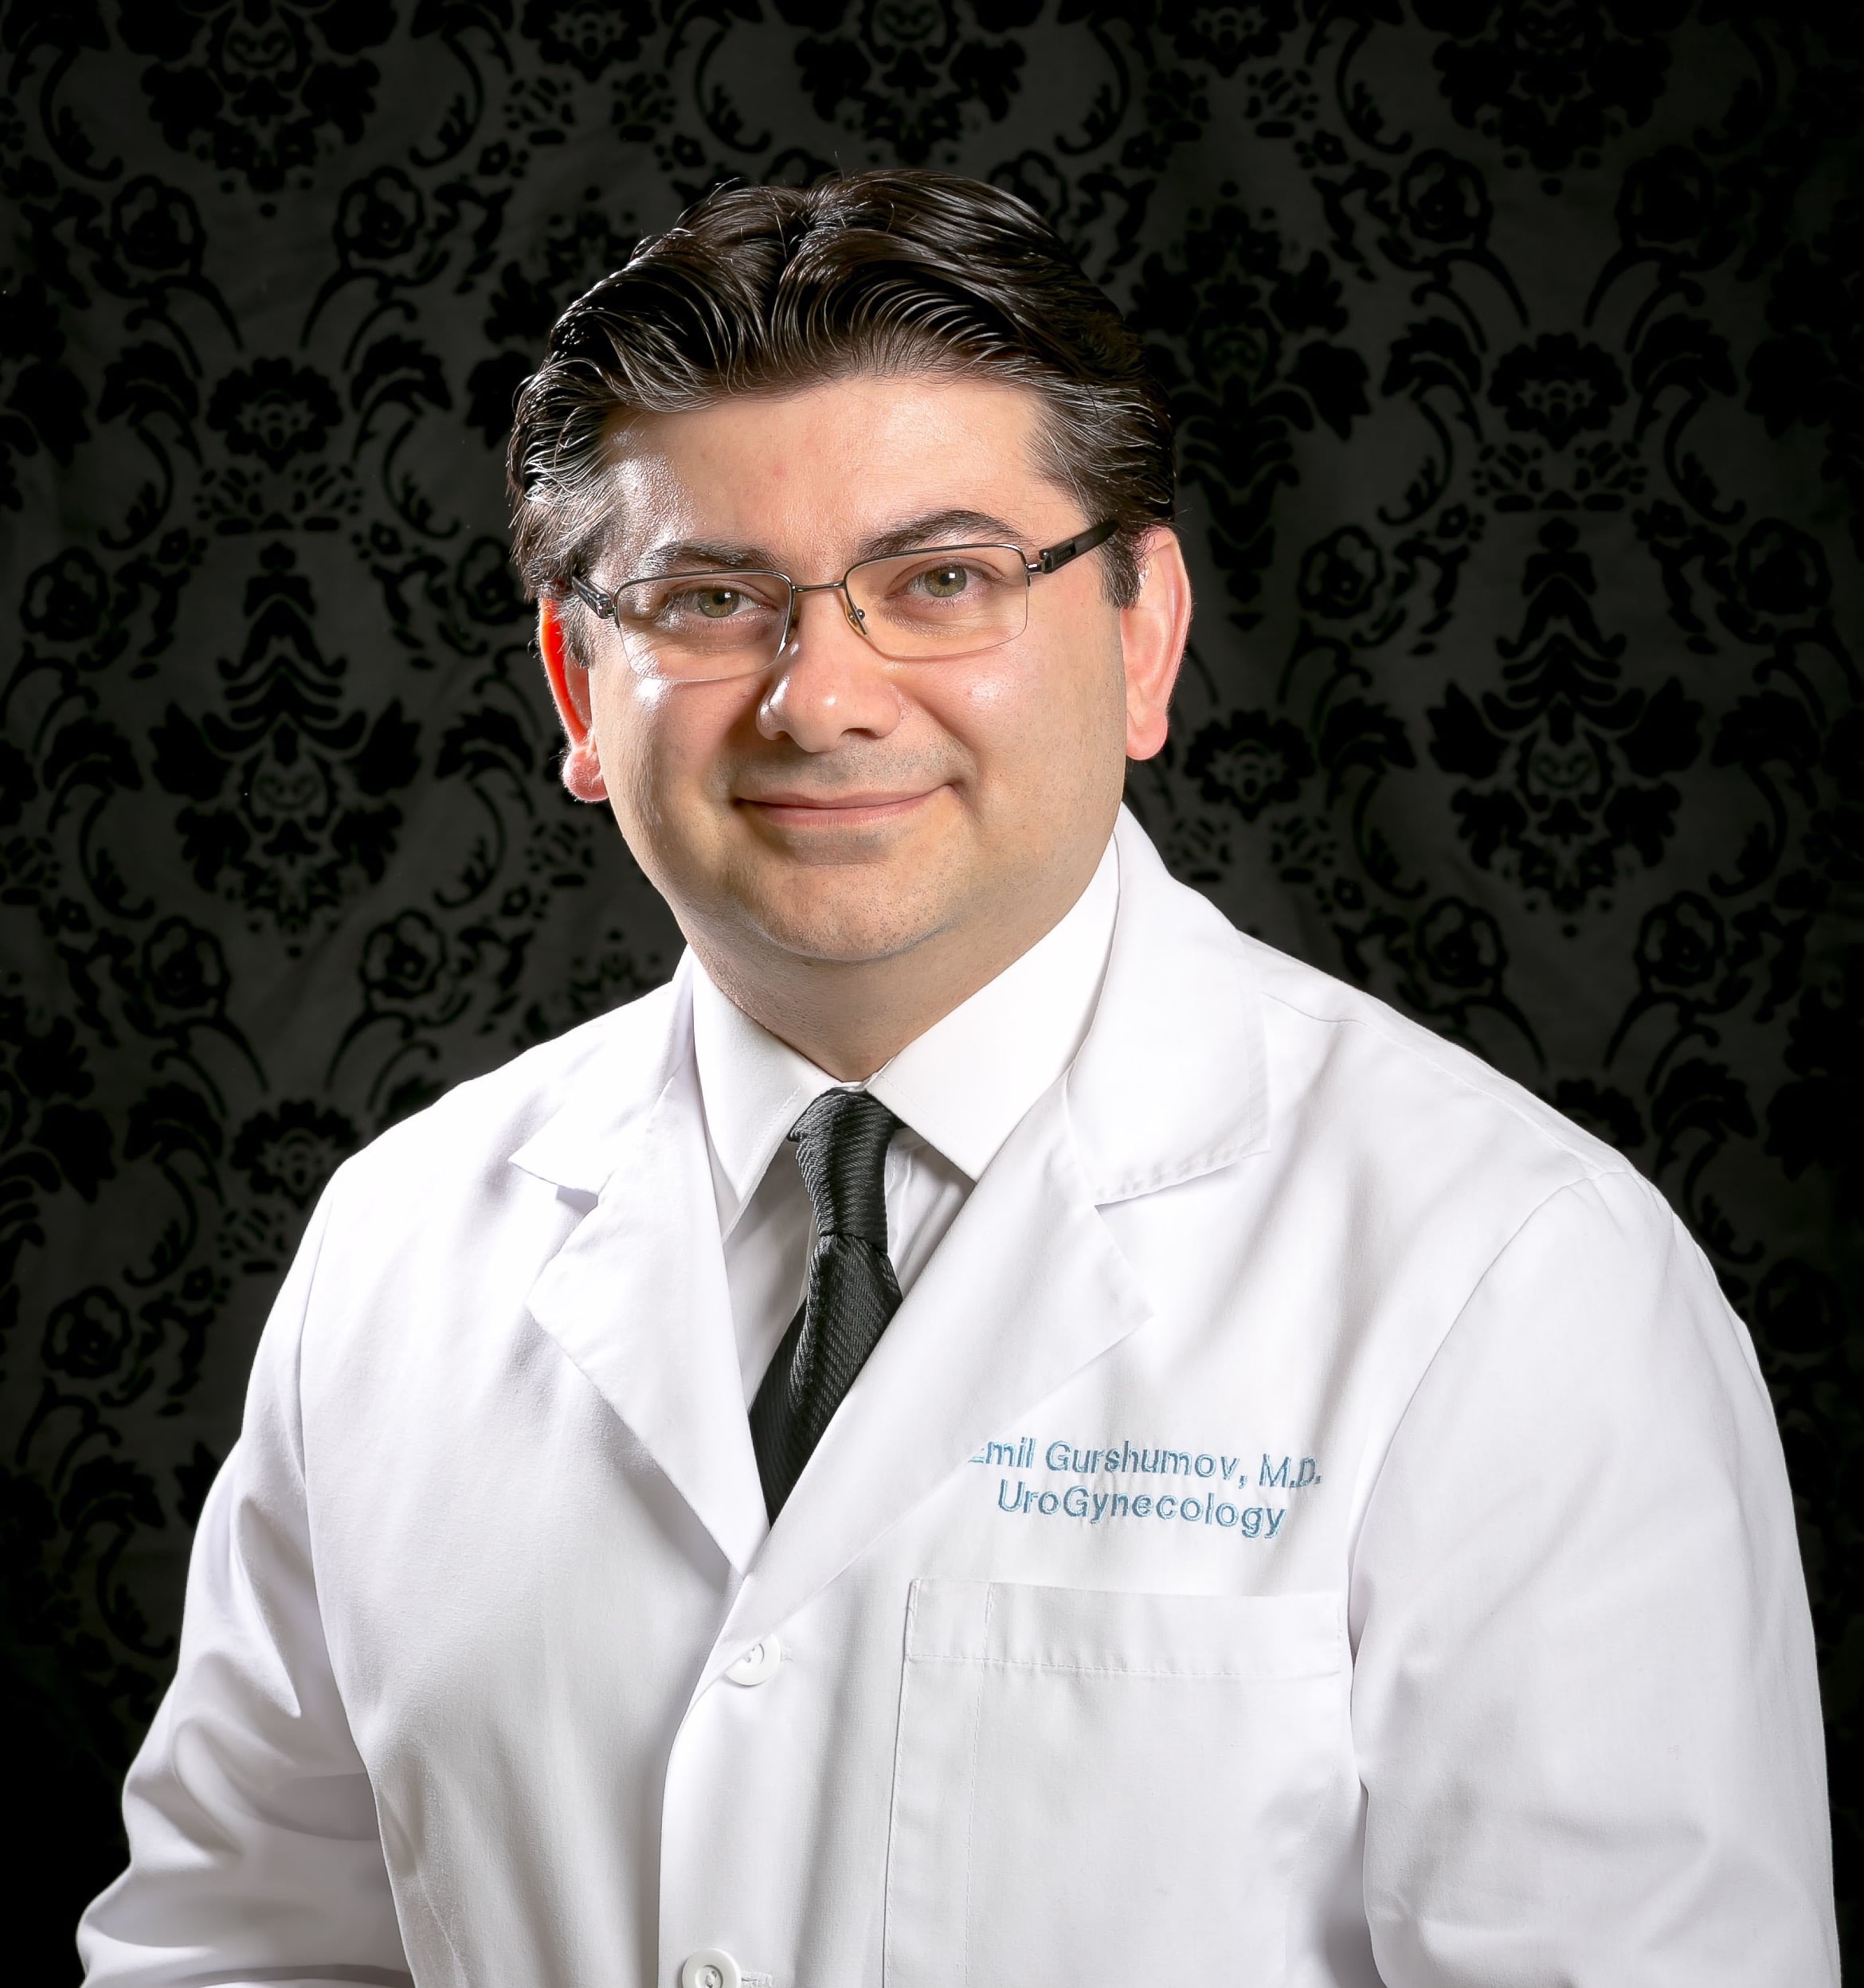 Dr. Emil L Gurshumov MD